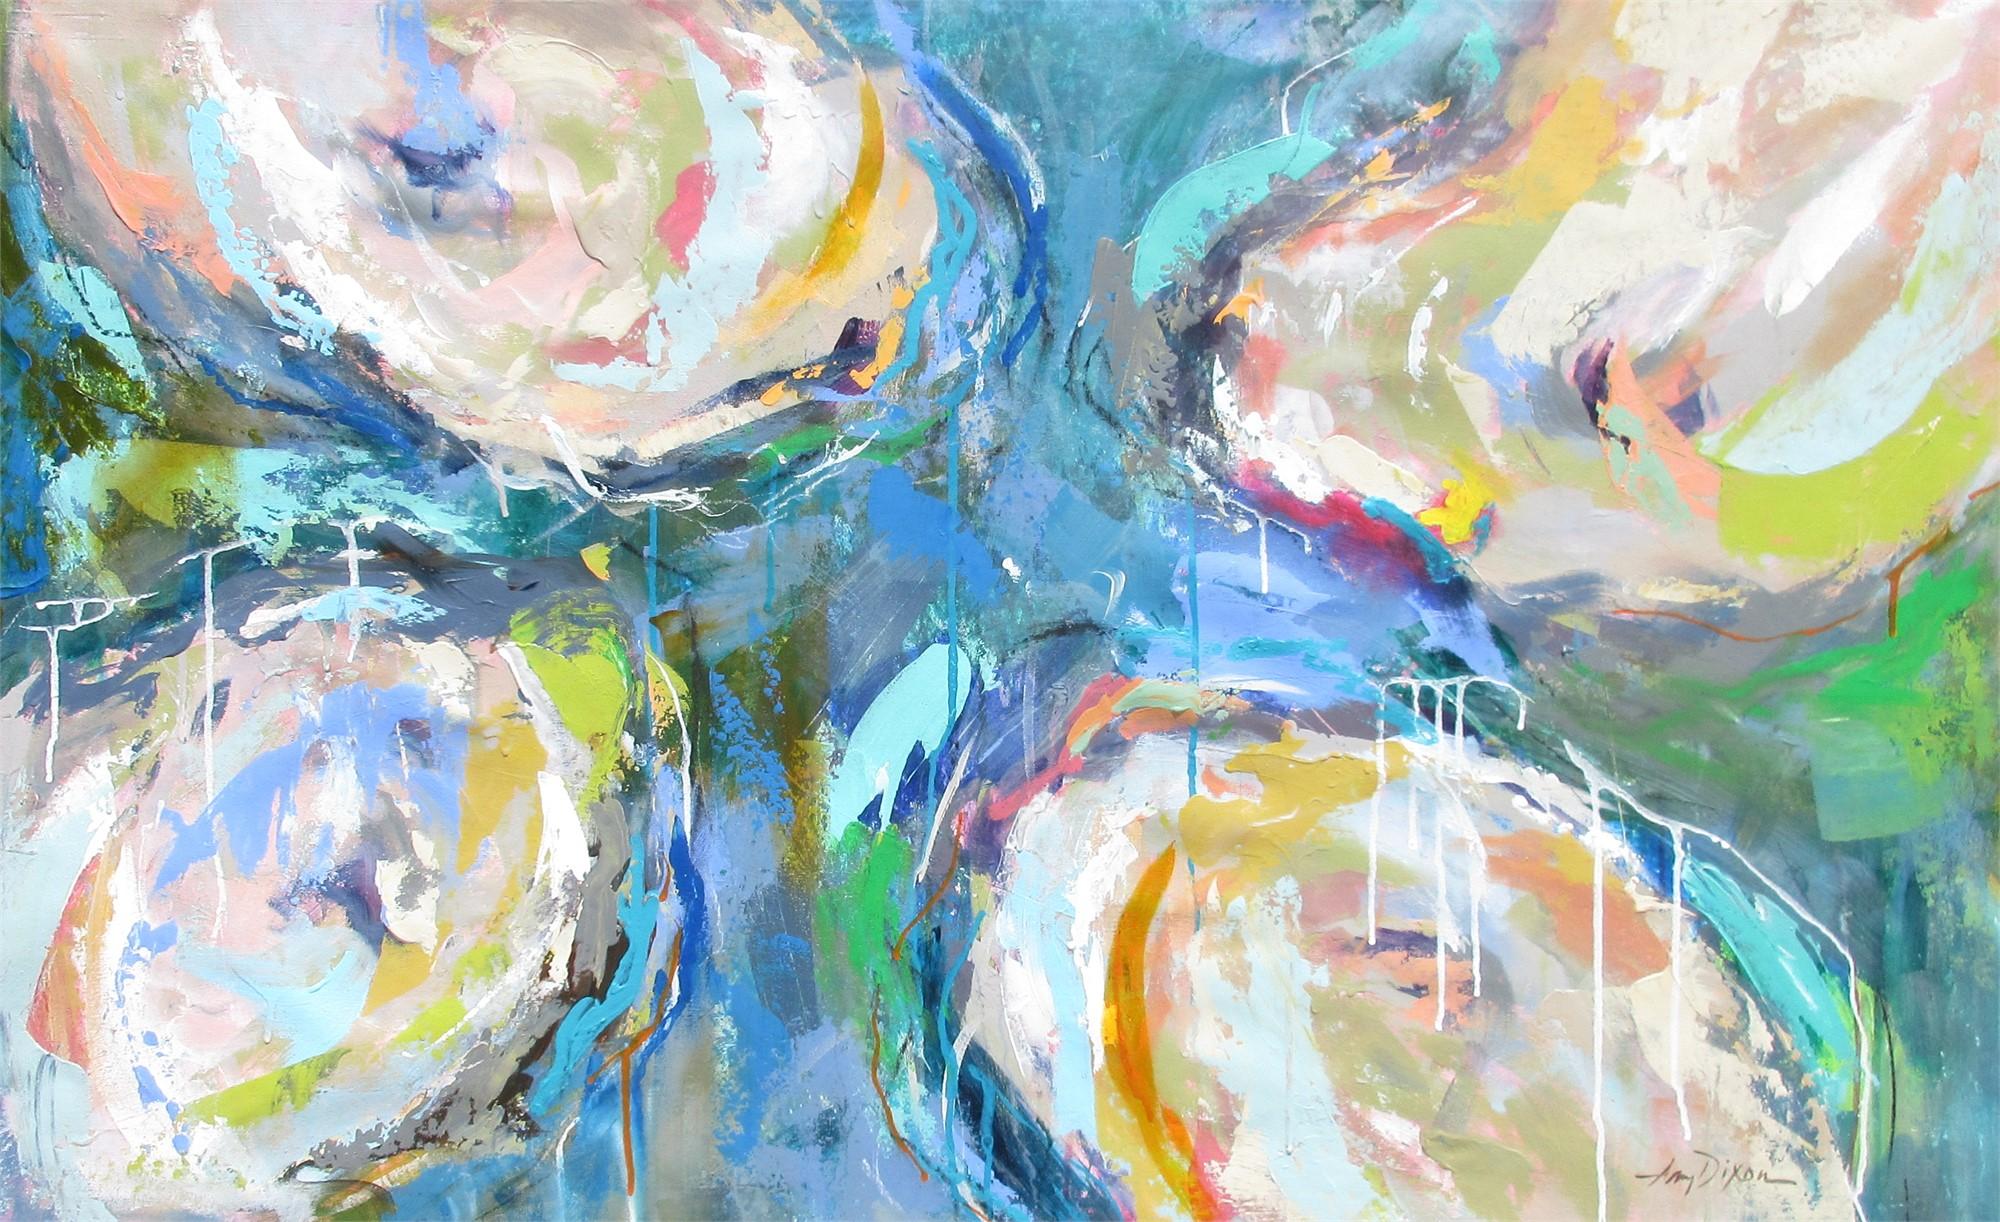 Oyster Capri by Amy Dixon